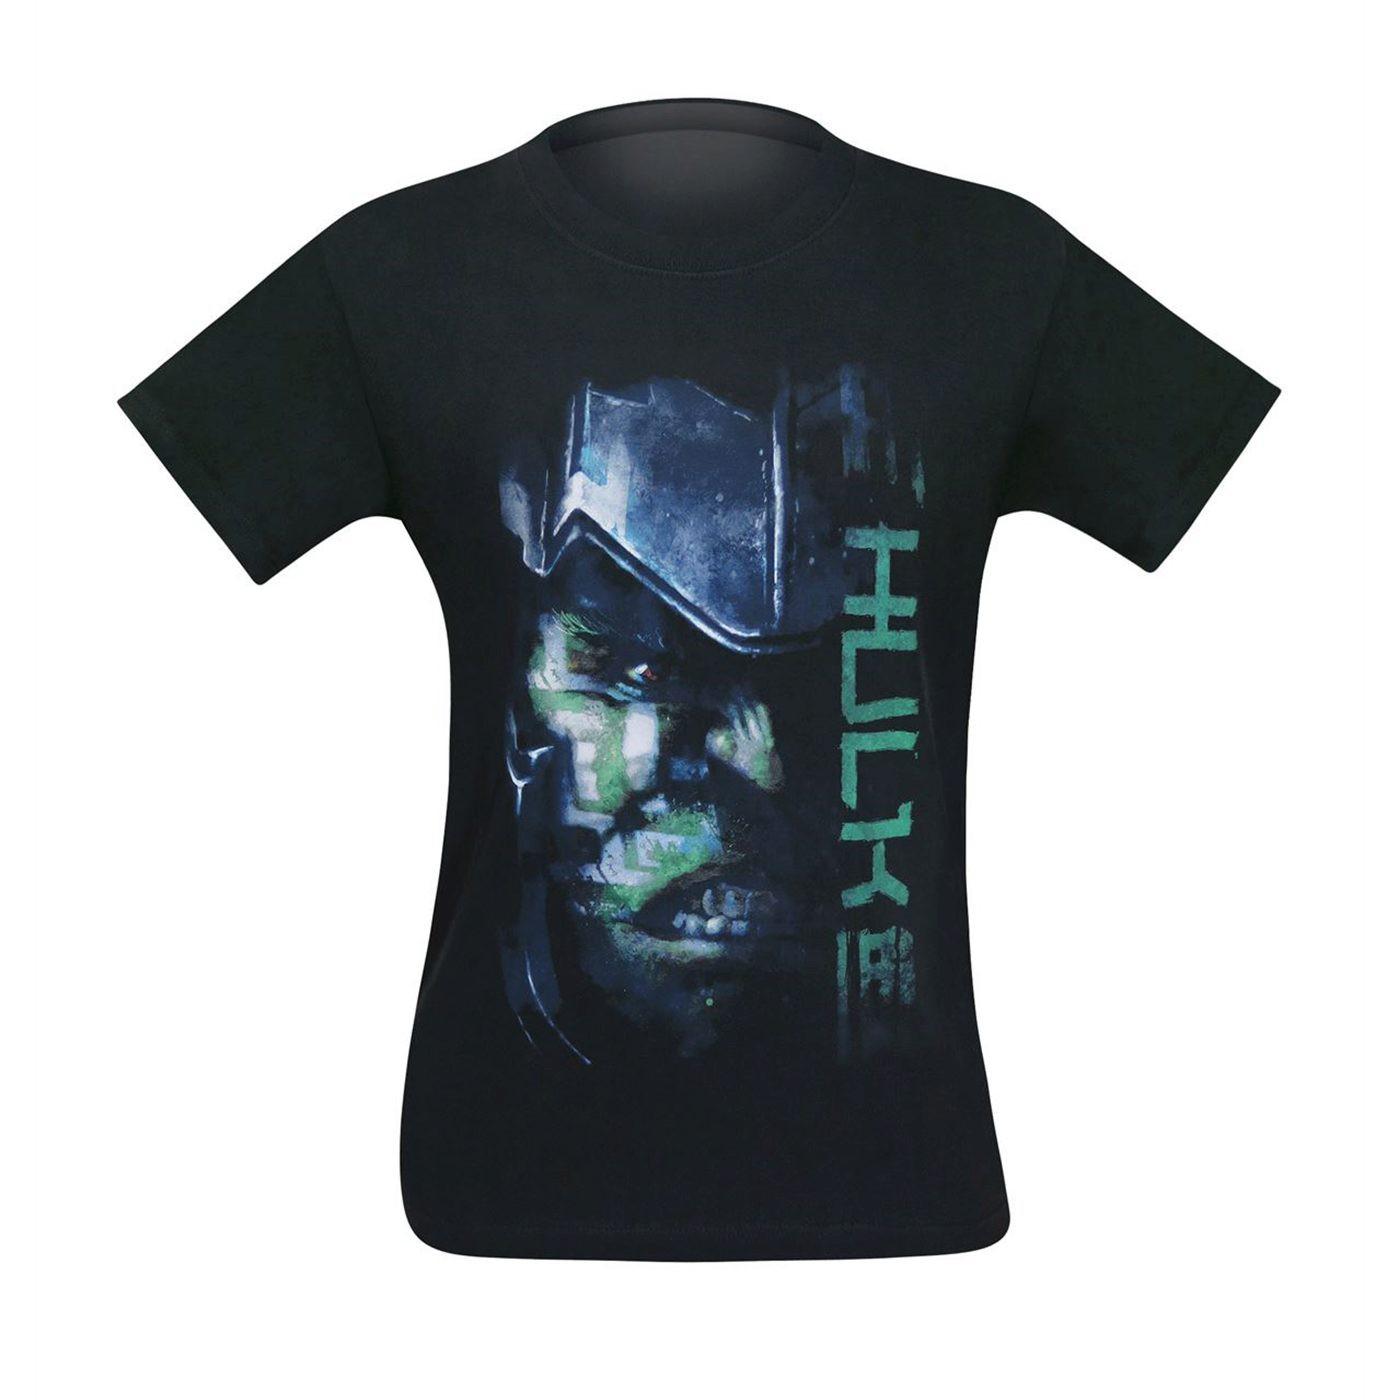 Hulk Thor Ragnarok Battle Face Men's T-Shirt